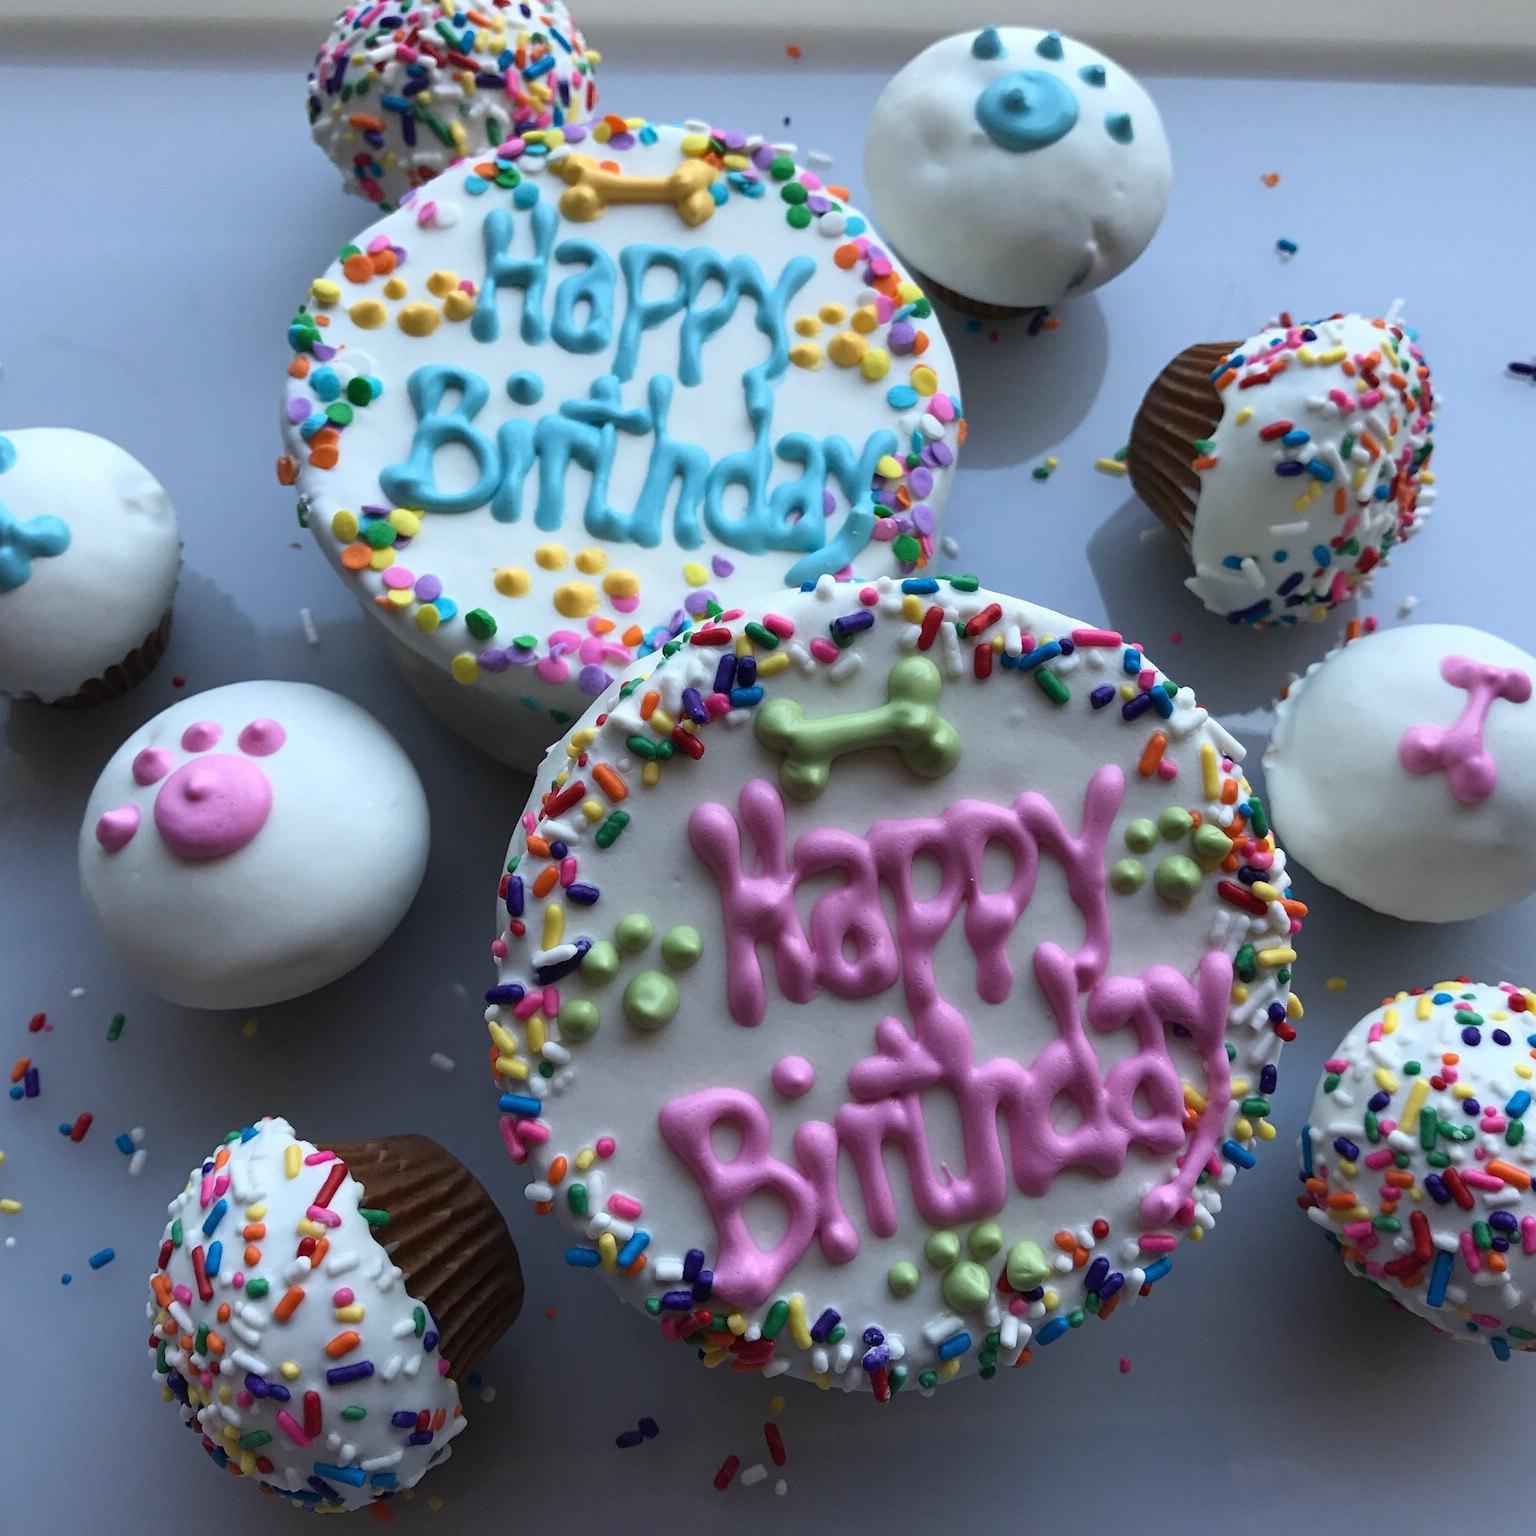 Dog Birthday Cakehomemade Gourmet Birthday Cake For Dogs Etsy